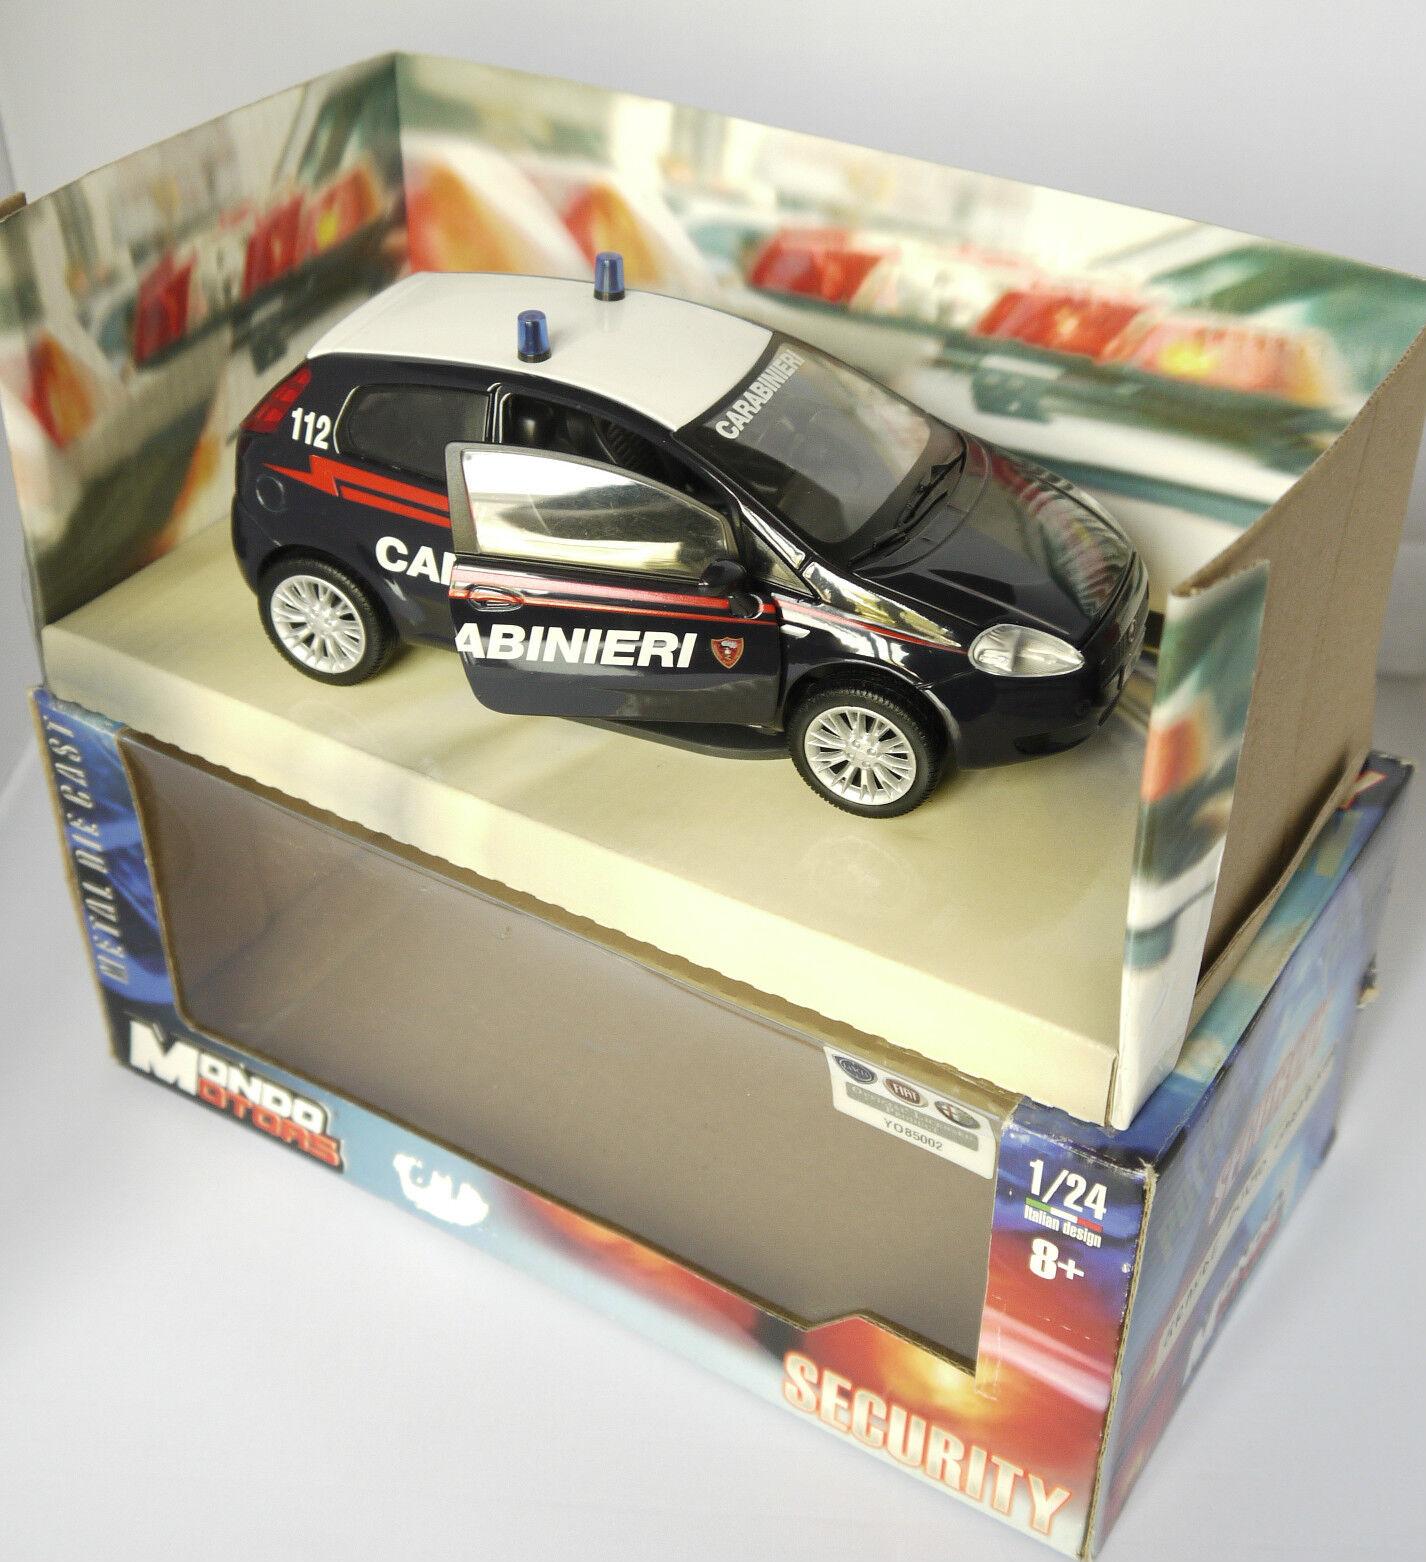 PRL) Carabinieri CC fiat punto  Police Force Army Emergency Model Polizei